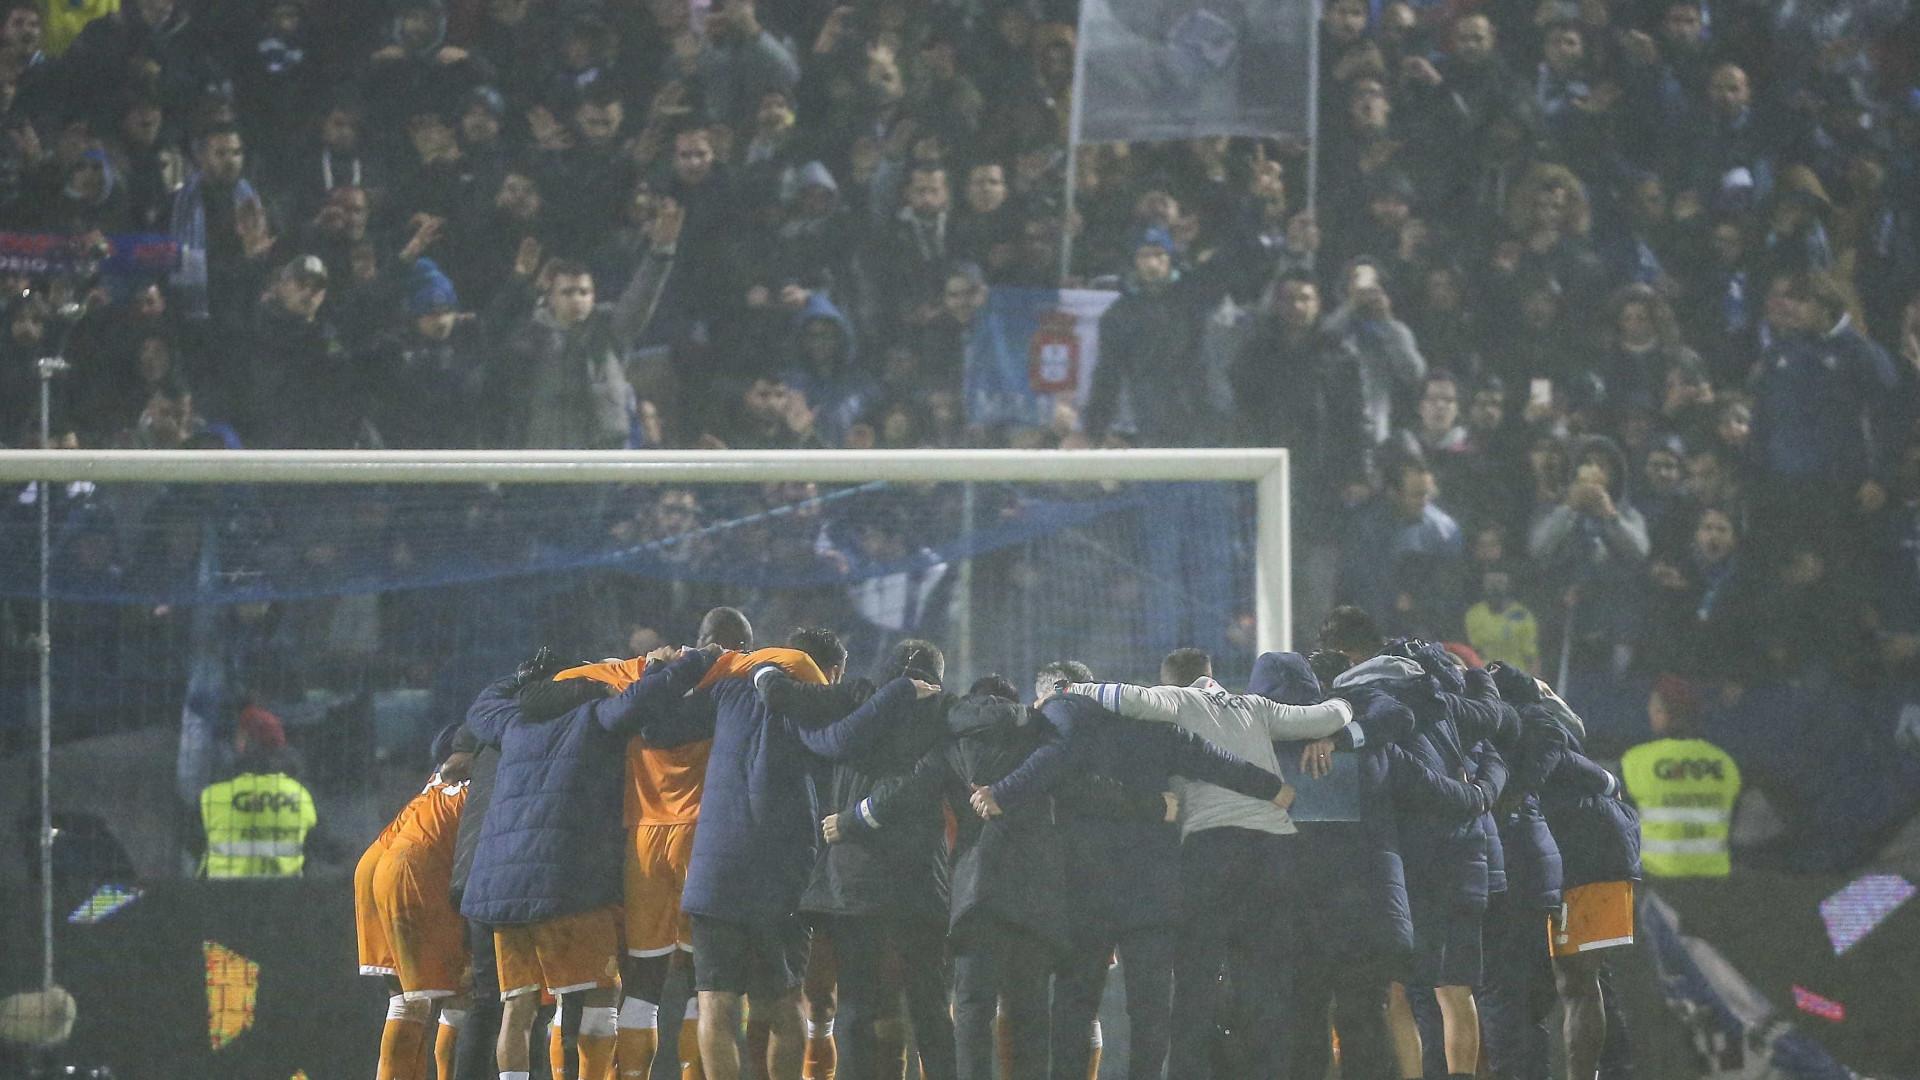 Roupeiro do FC Porto para Fábio Veríssimo: